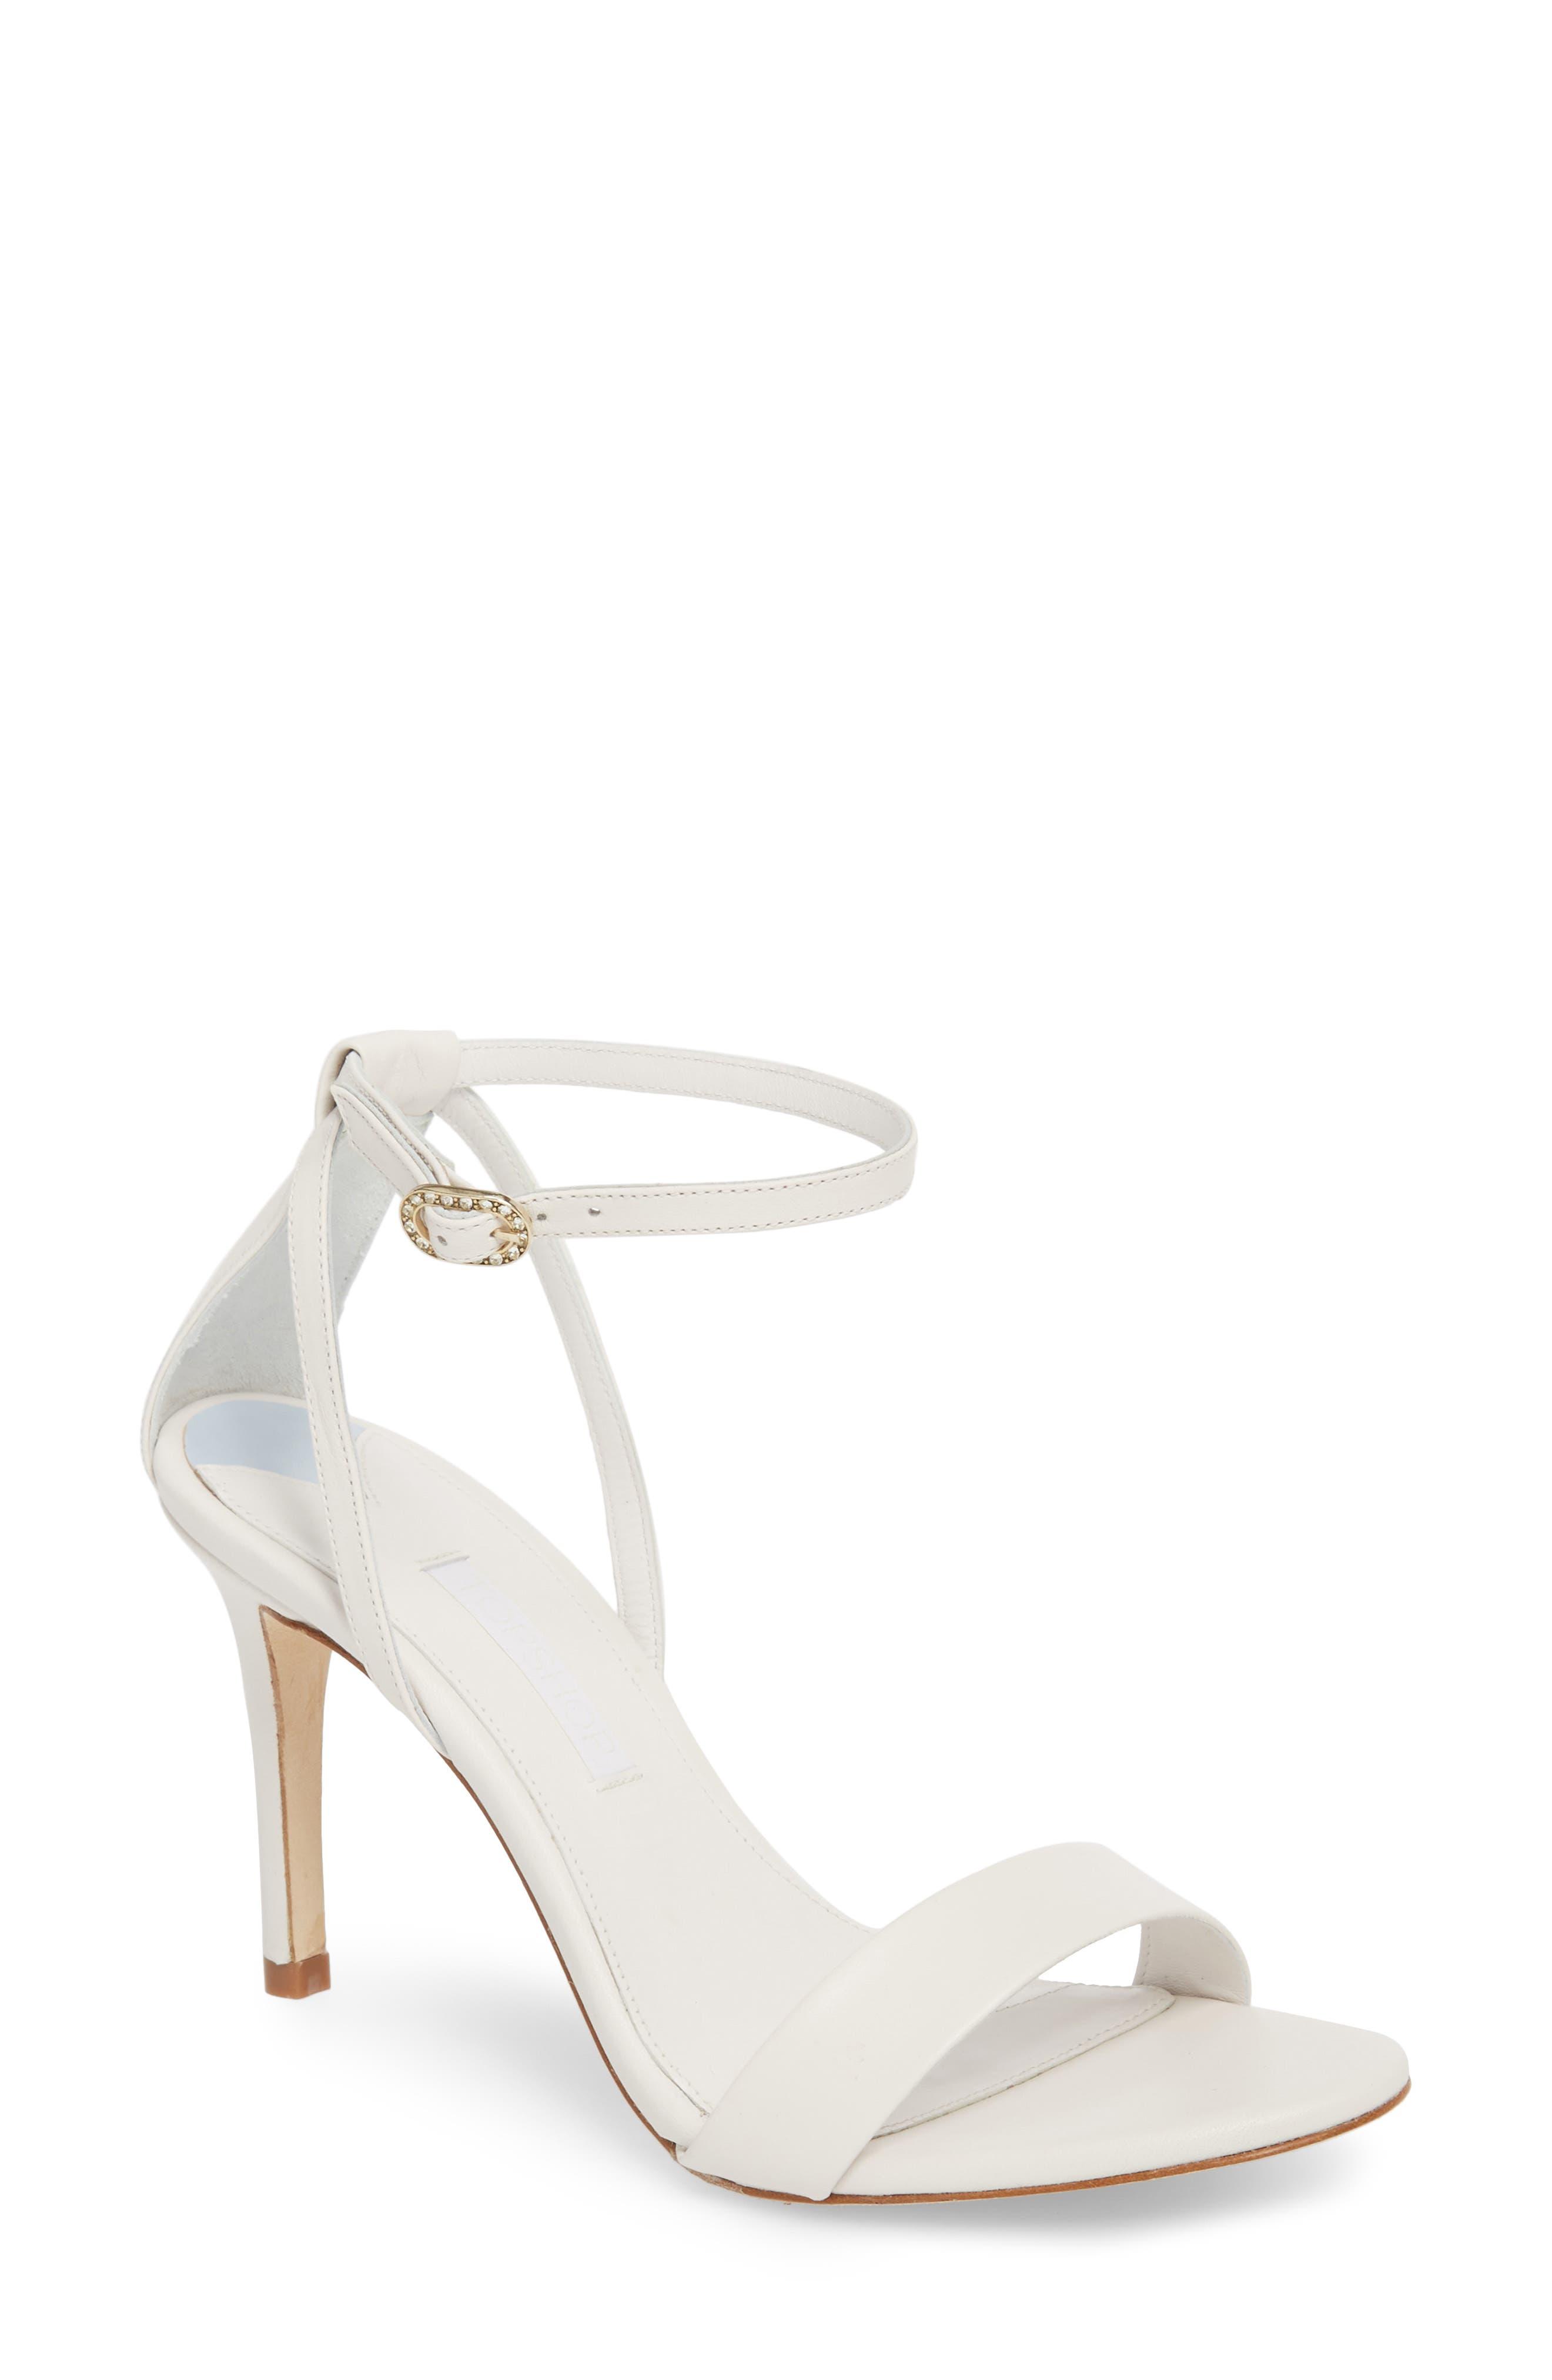 Bea Halo Strap Sandal,                         Main,                         color, White